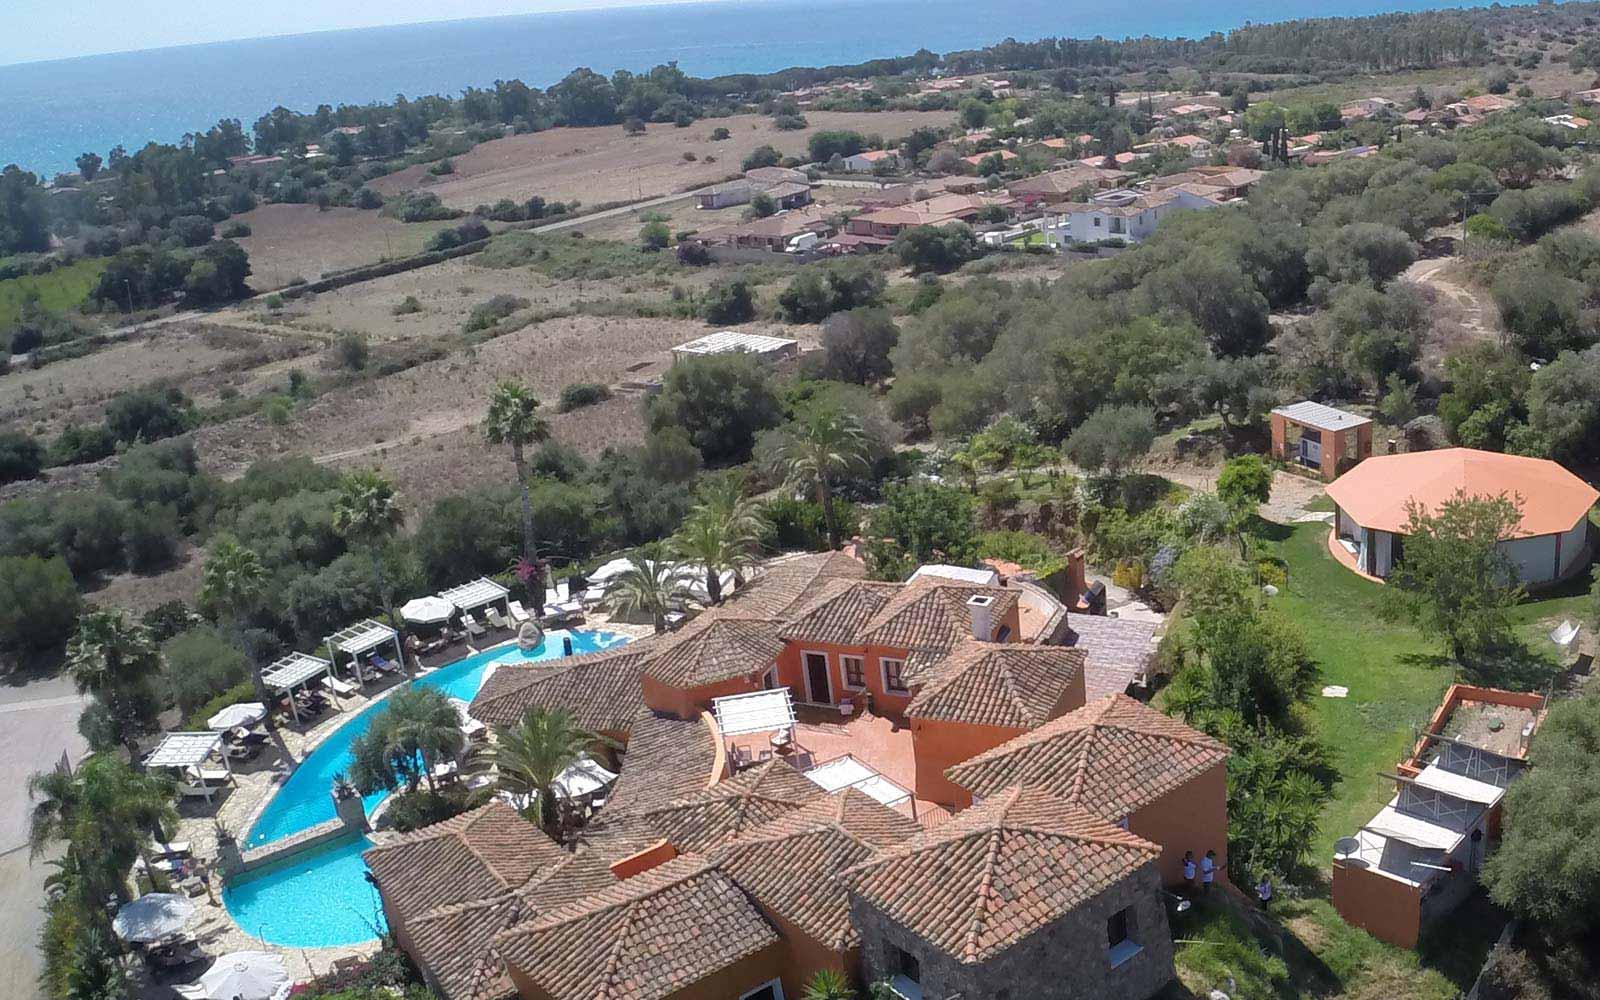 Galanias Hotel aerial view